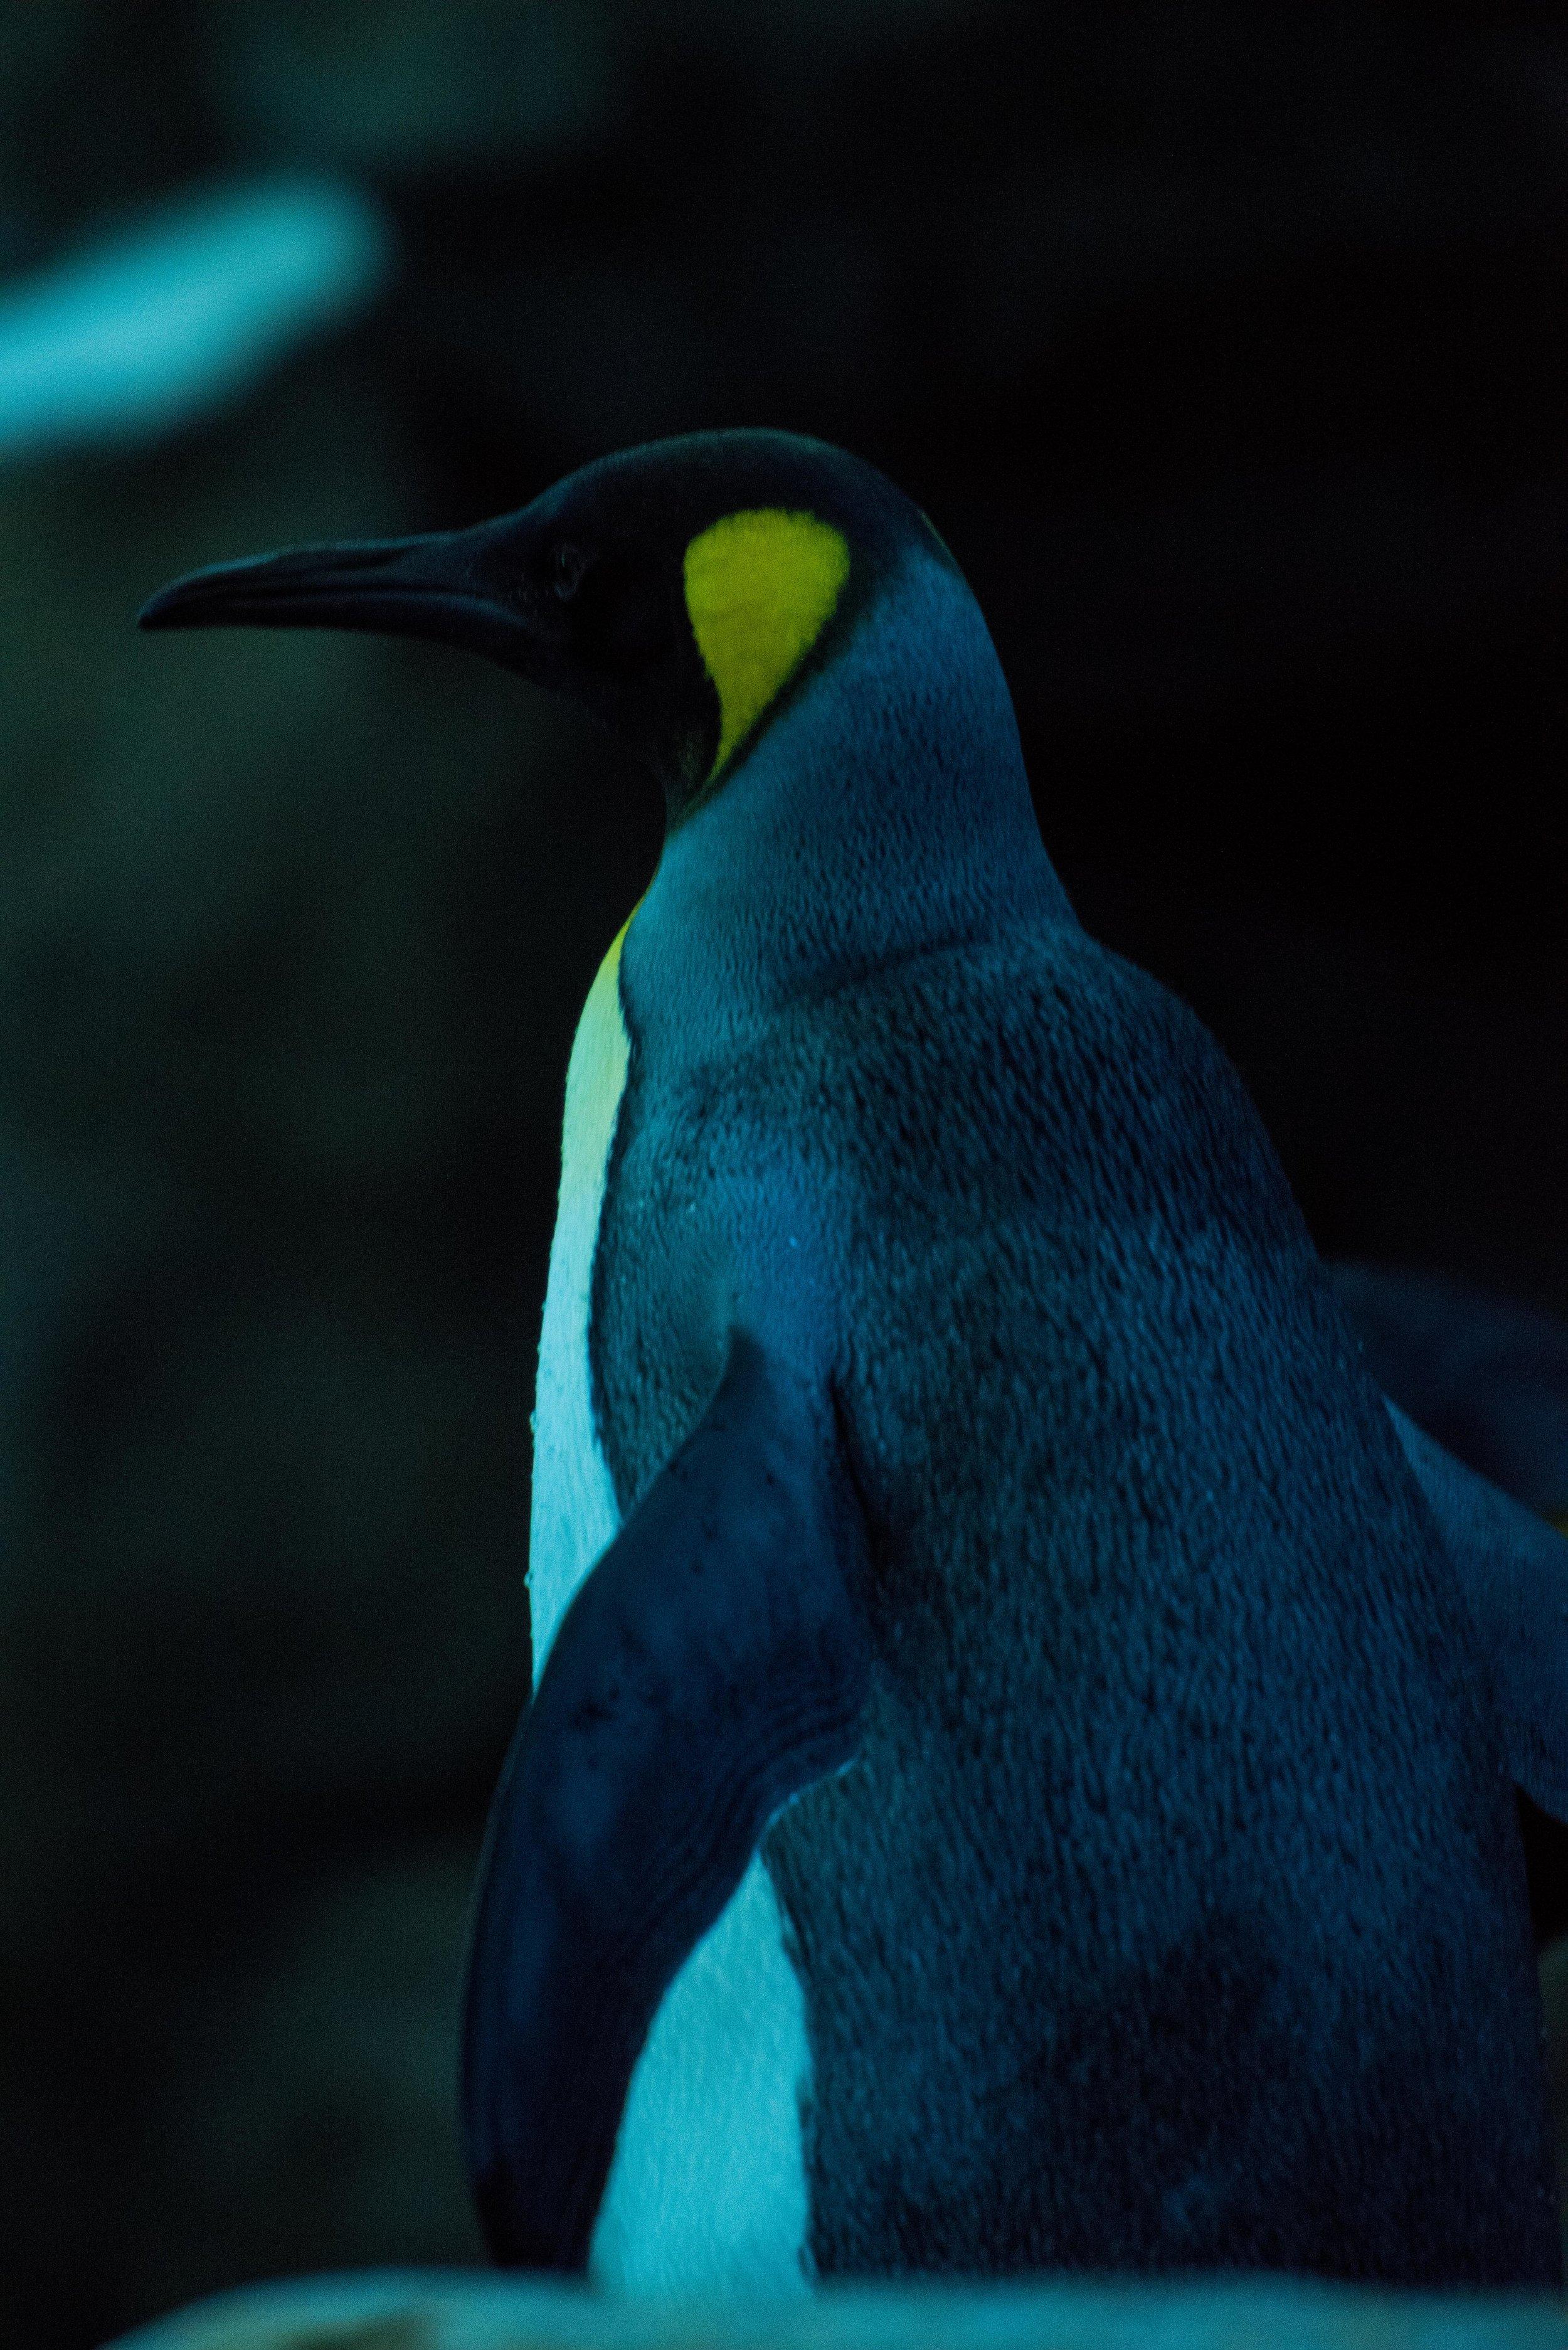 calgary zoo-3241.jpg